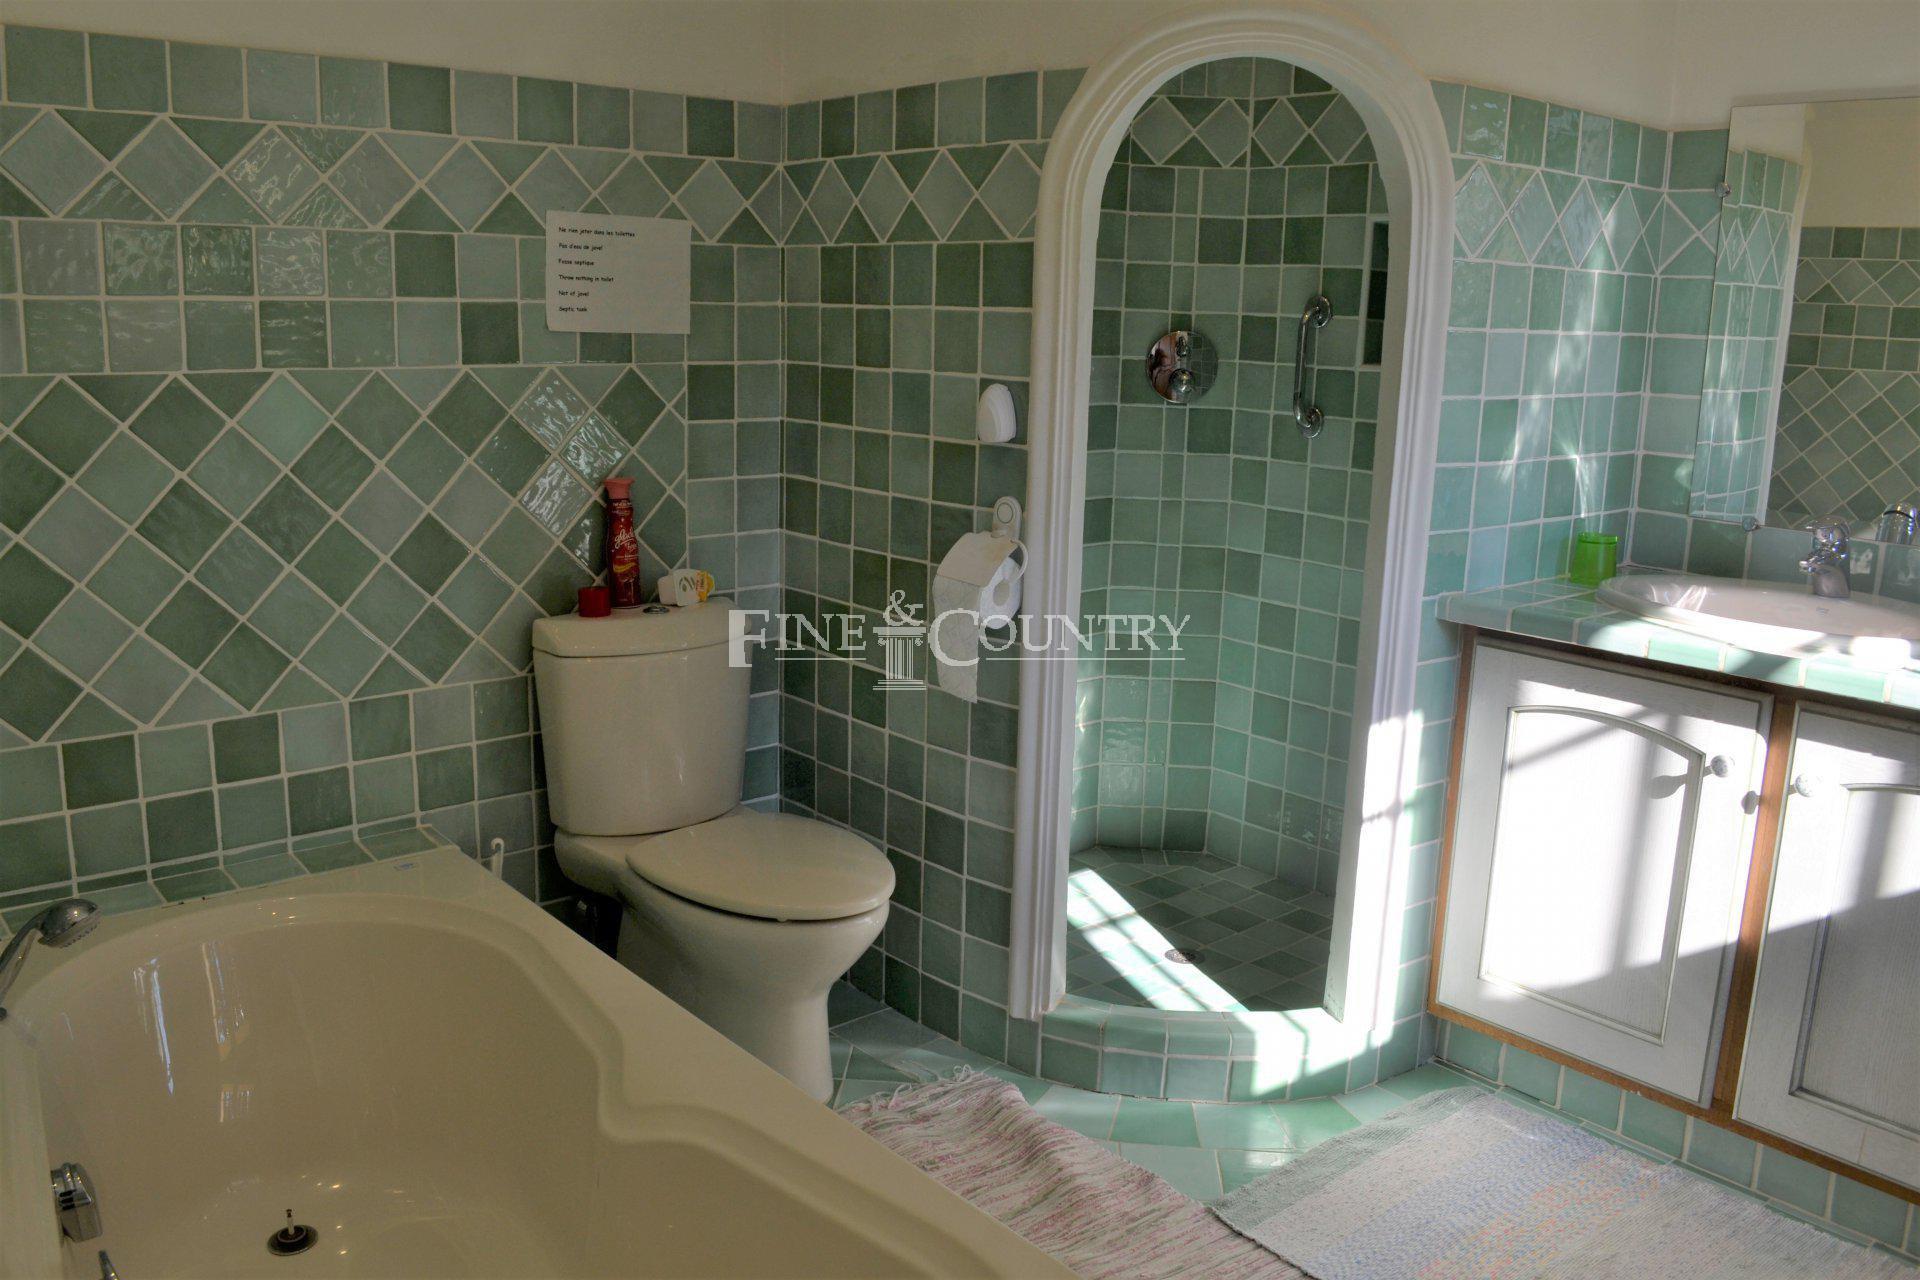 Bathroom, traditional tiles, heated floors